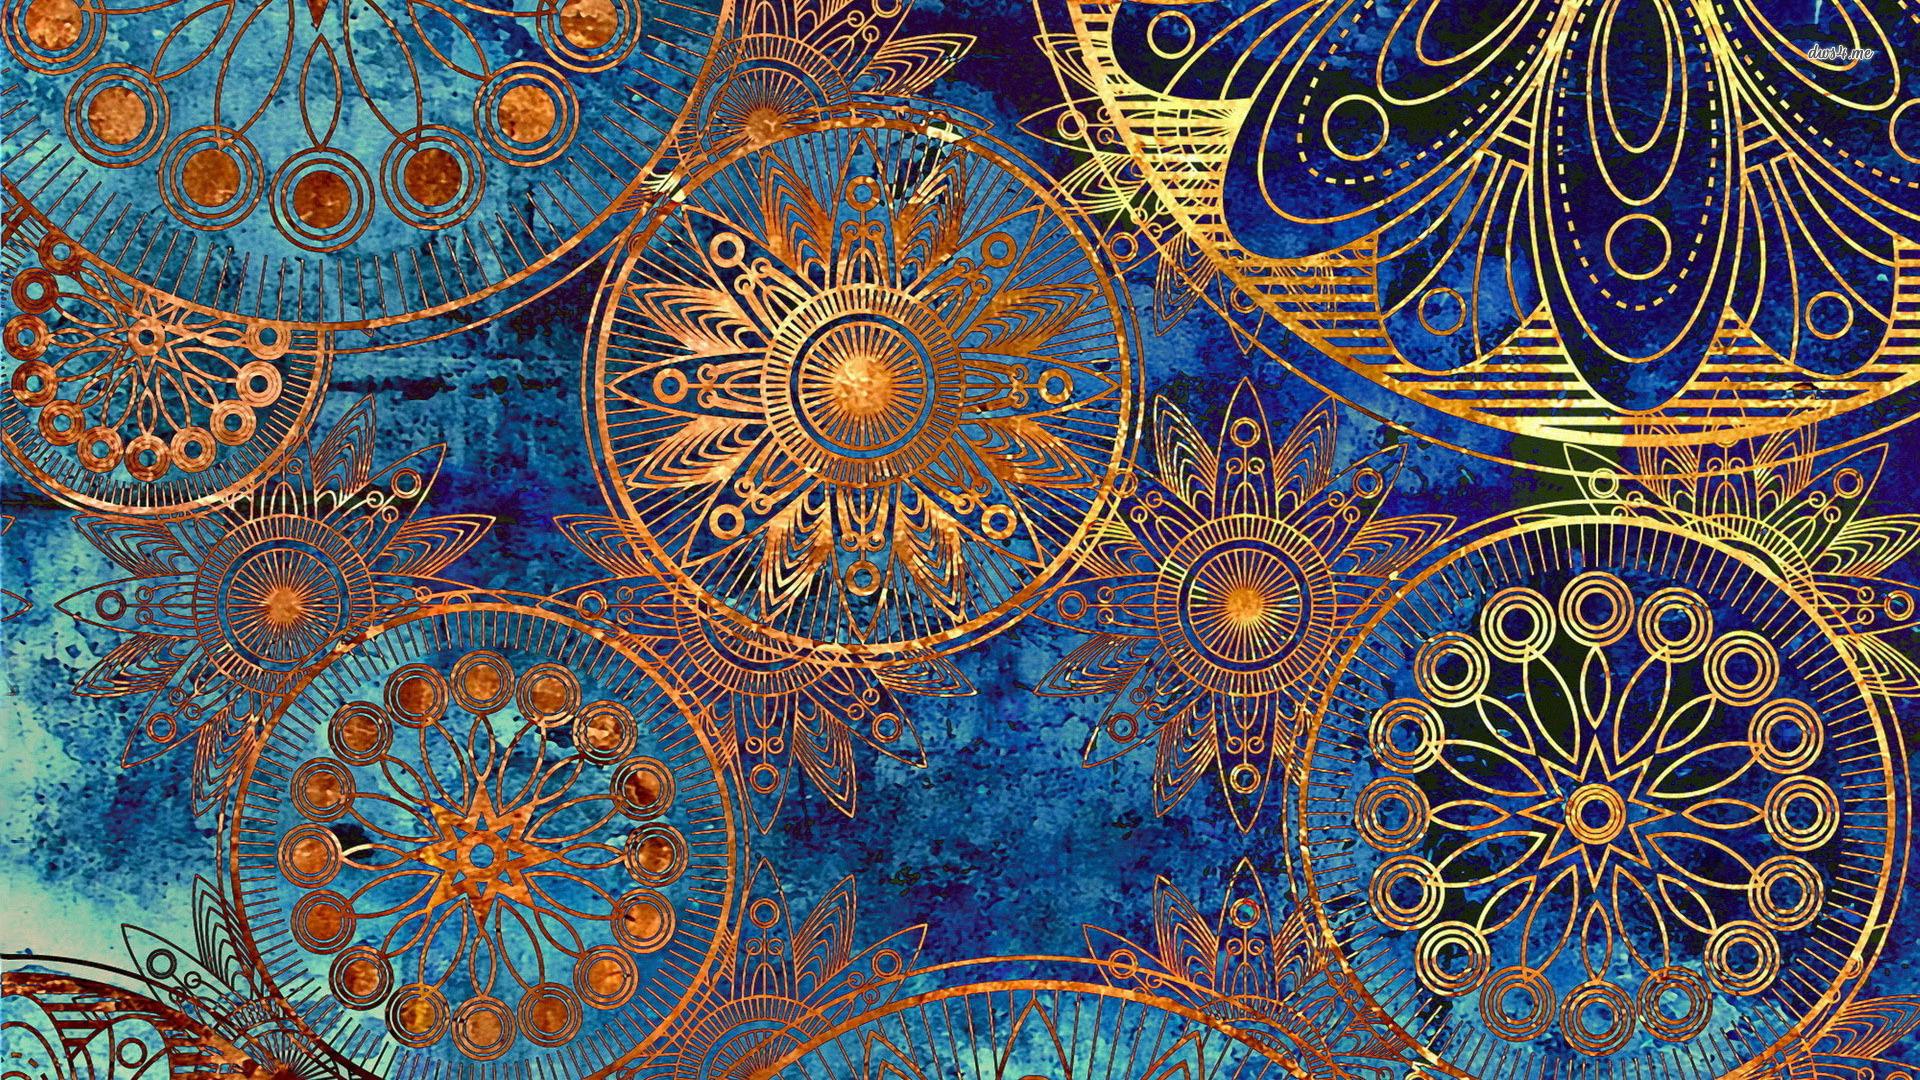 Pattern Wallpapers Best Wallpapers 1920x1080